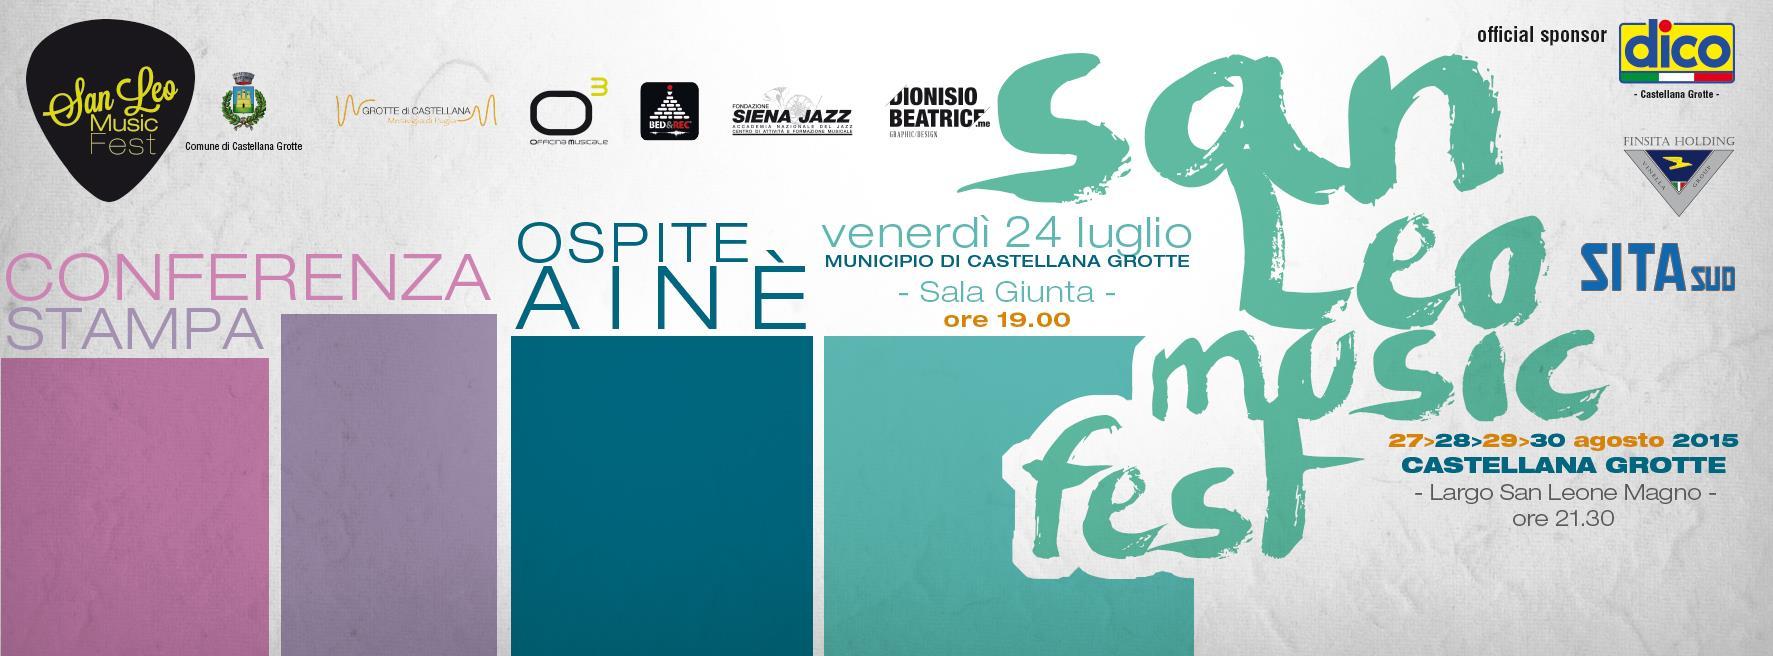 Conferenza stampa - SAN LEO MUSIC FEST 2015